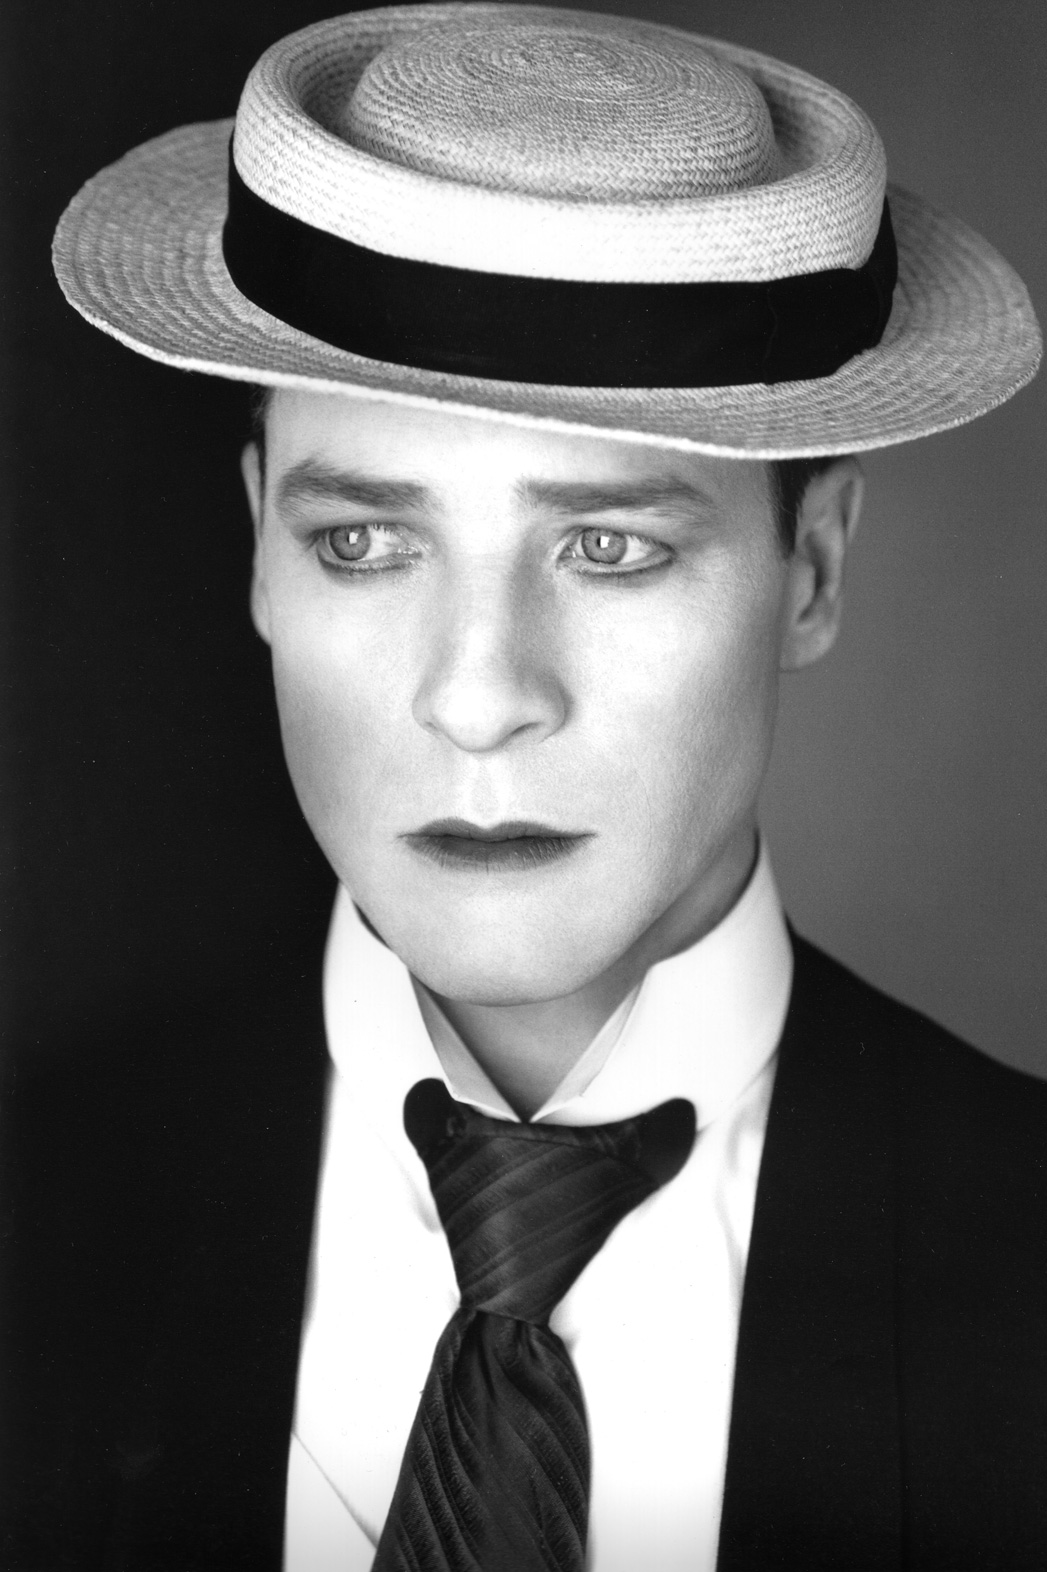 French Stewart as Buster Keaton - P 2014